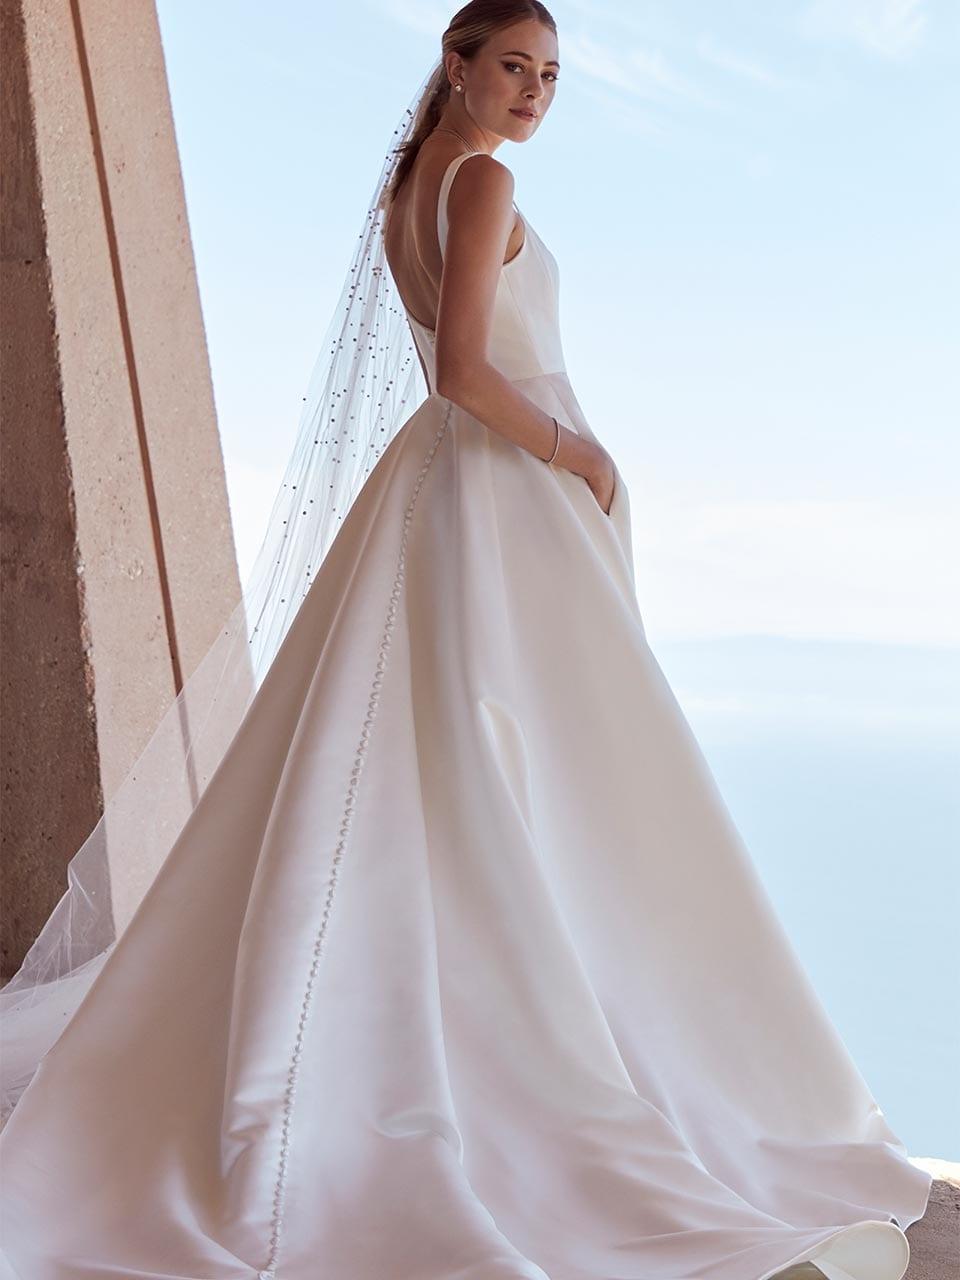 Pearl's Bridal Watters Bridal Dress